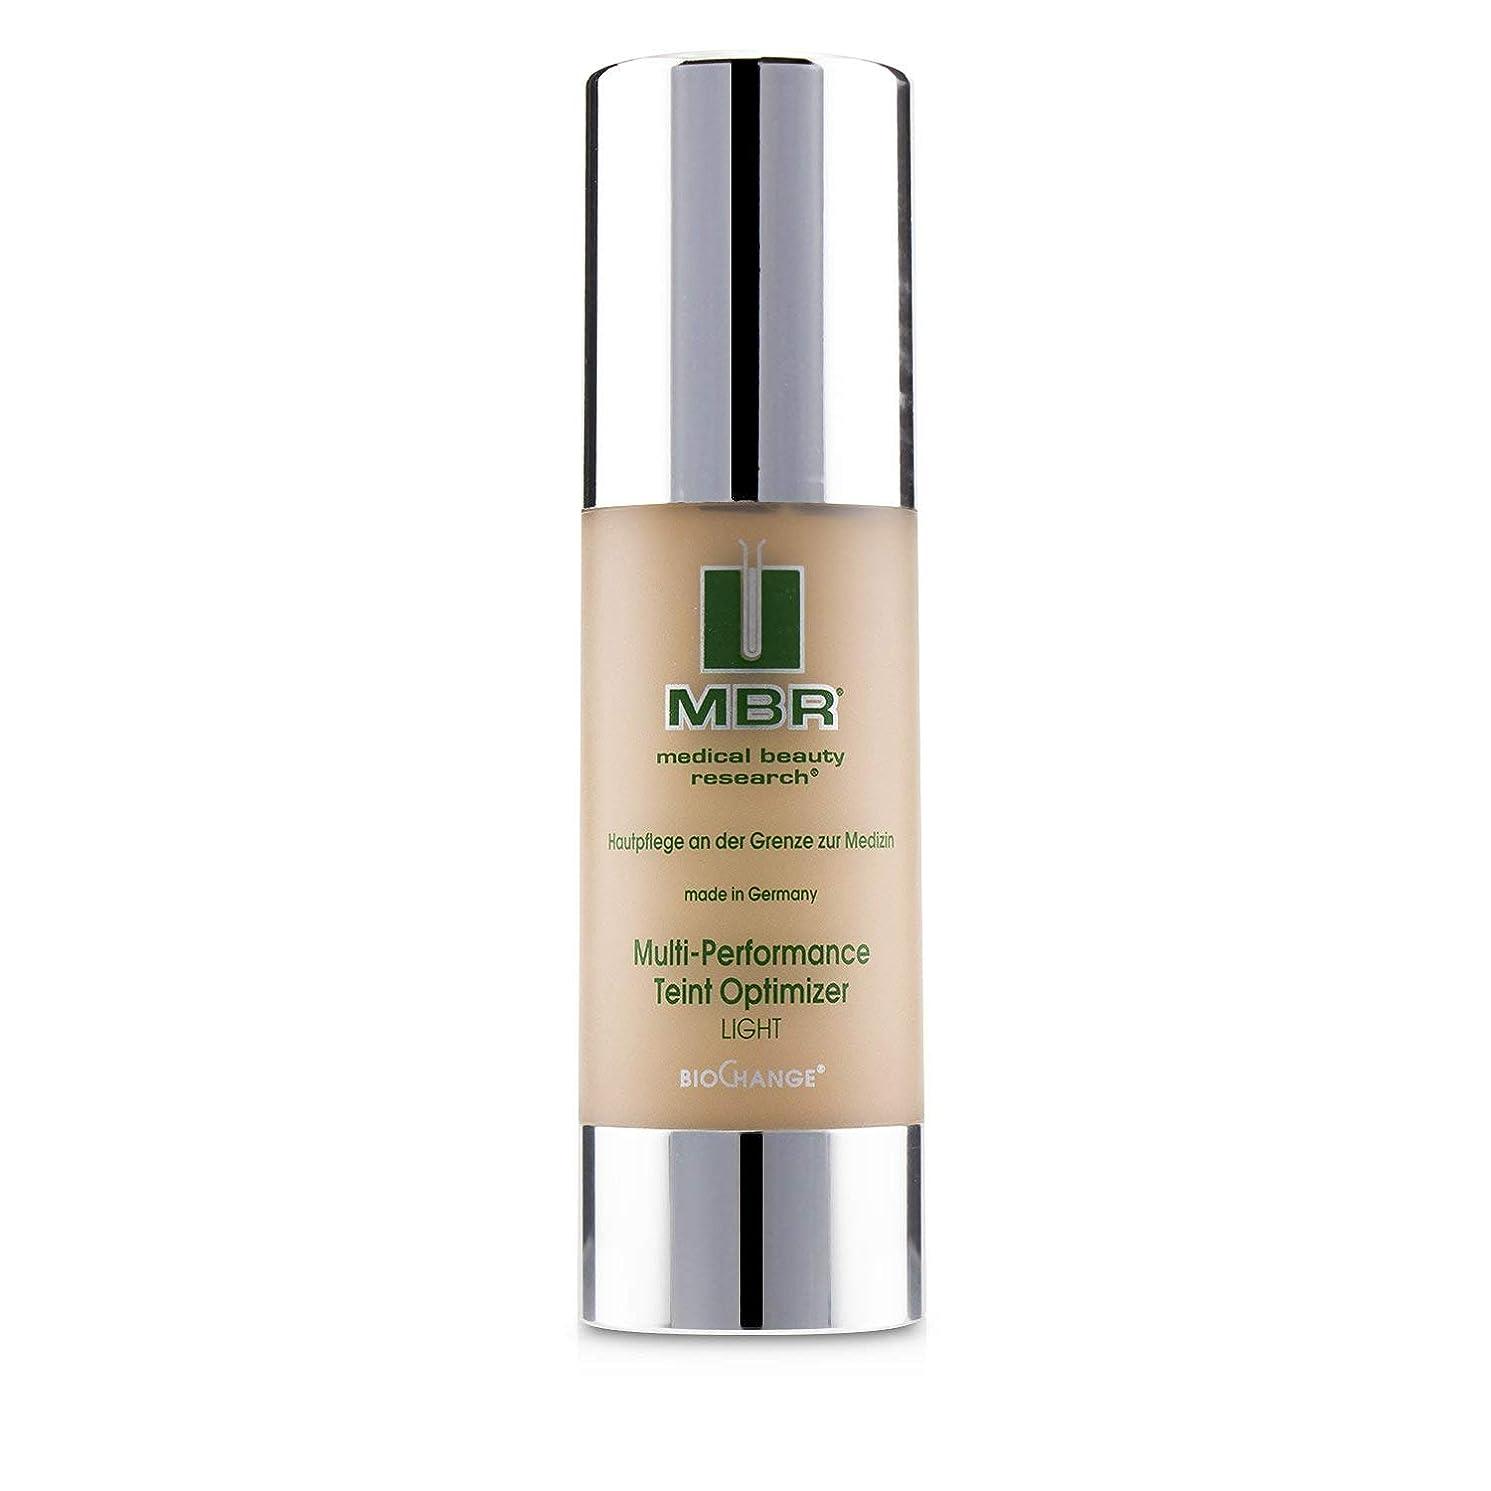 海上前奏曲達成MBR Medical Beauty Research BioChange Multi-Performance Teint Optimizer - #Light 30ml/1oz並行輸入品